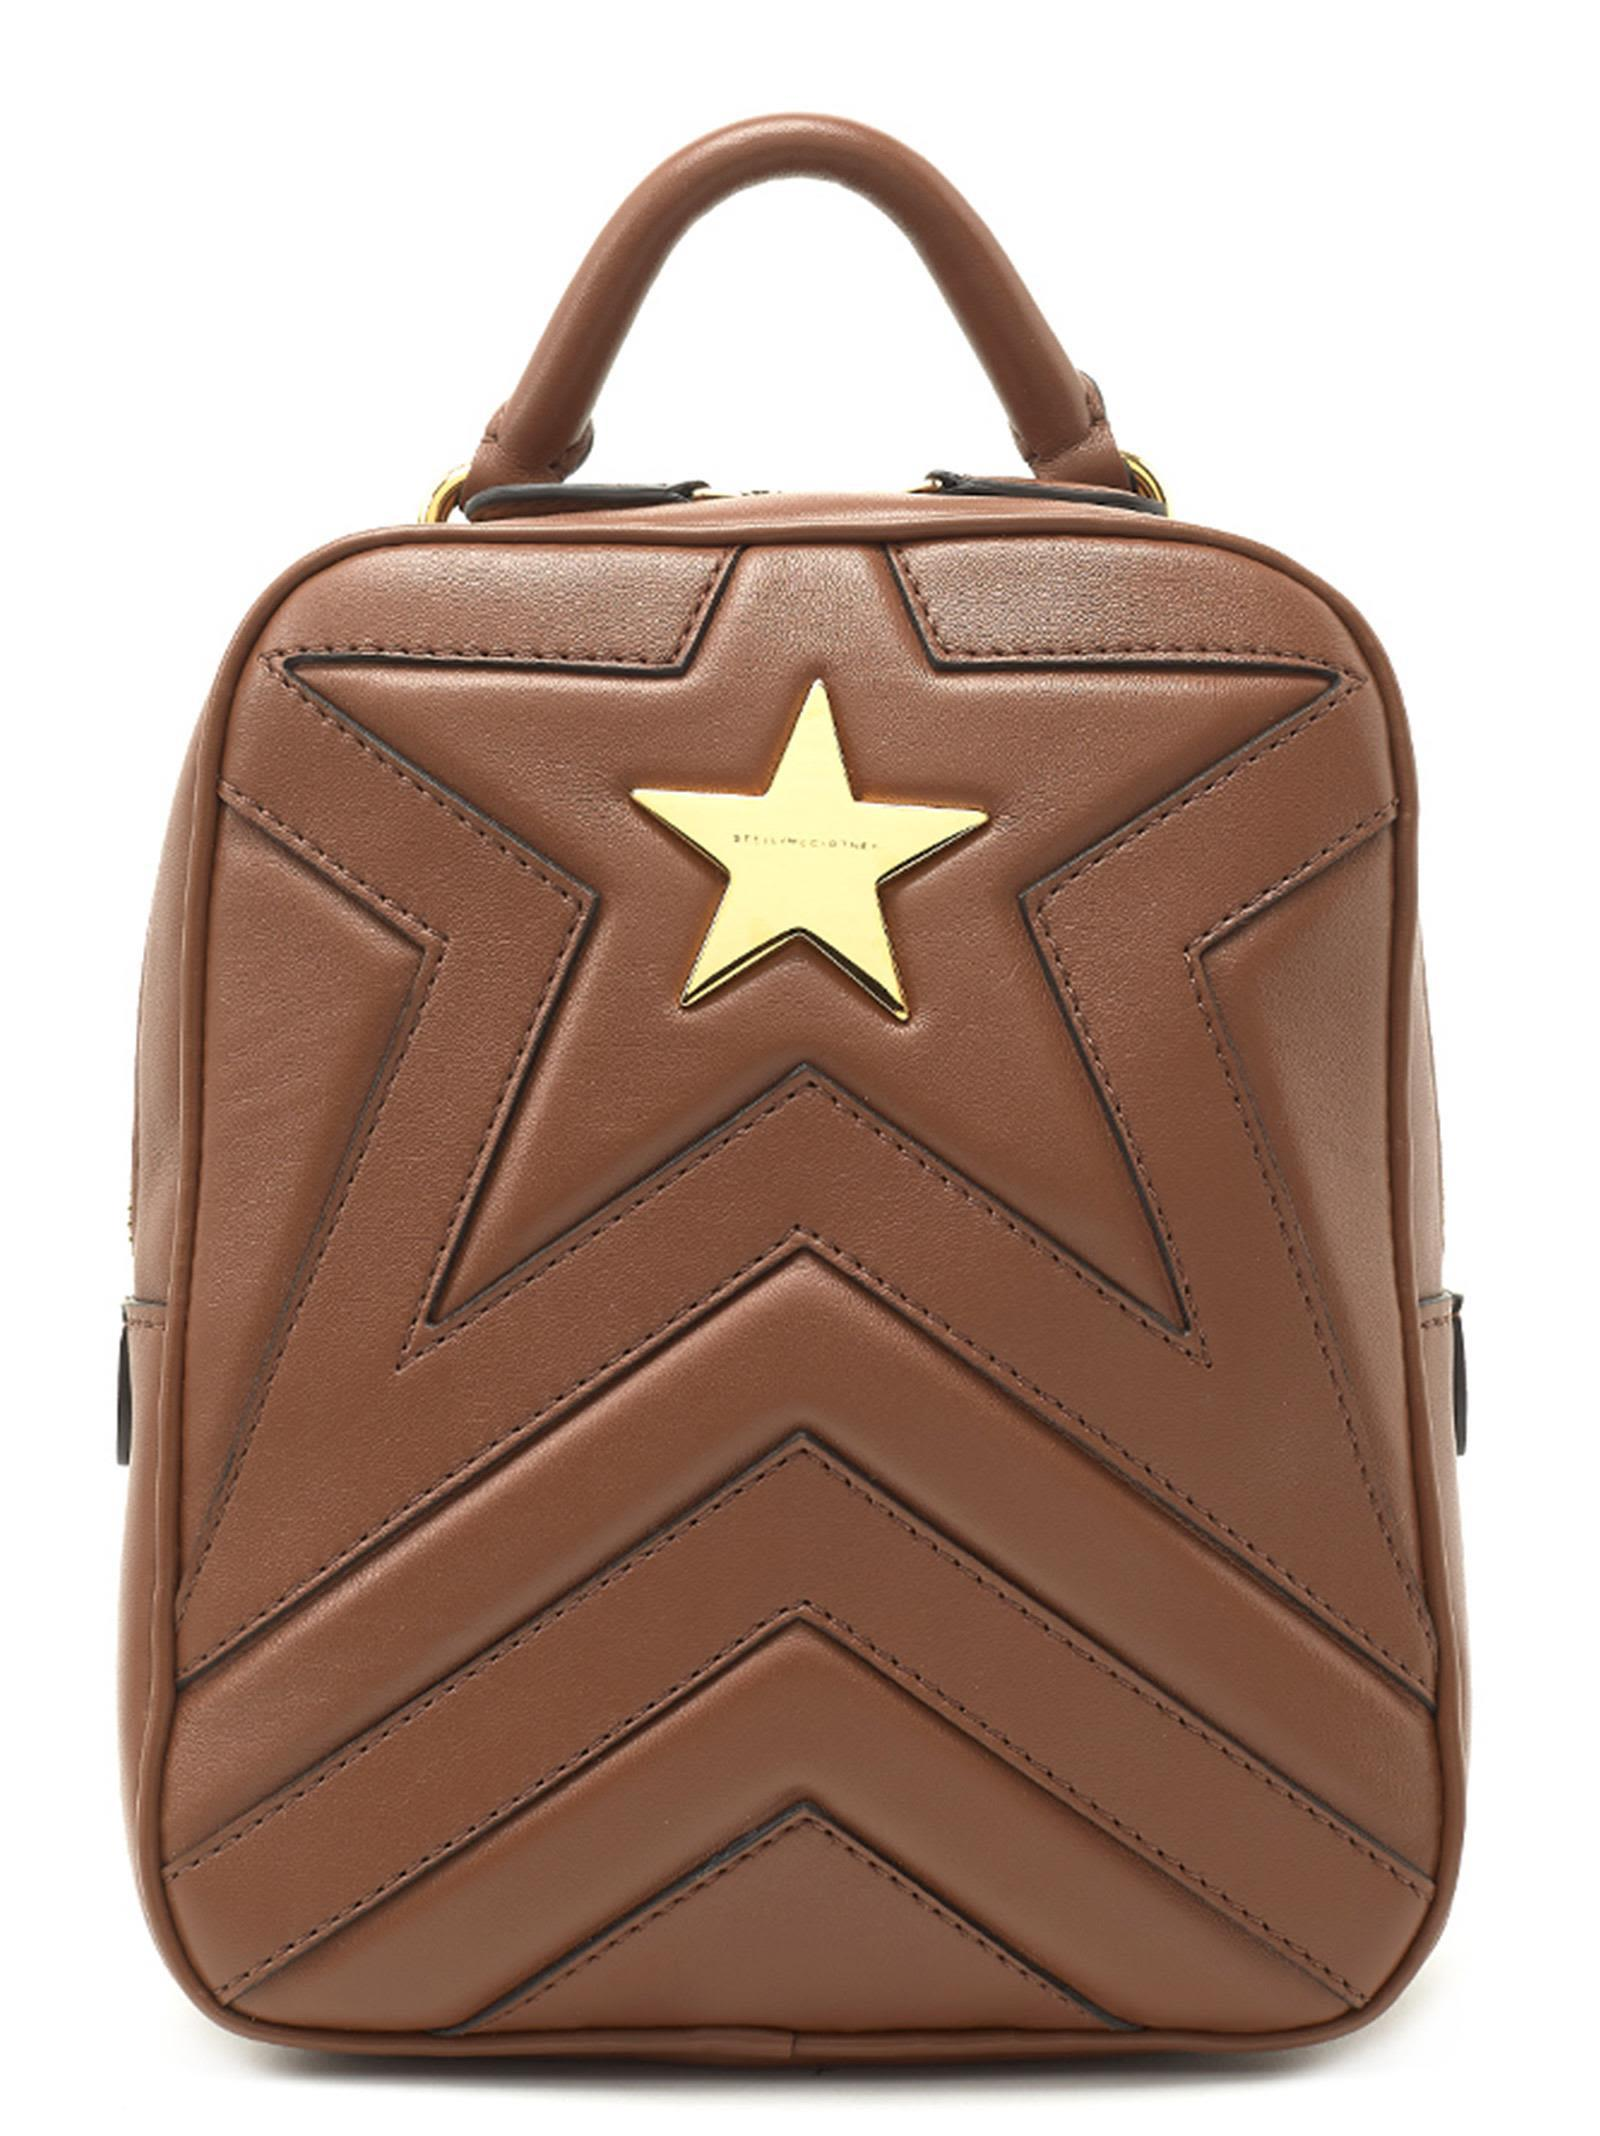 Stella Mccartney 'stella Star' Bag In Brown